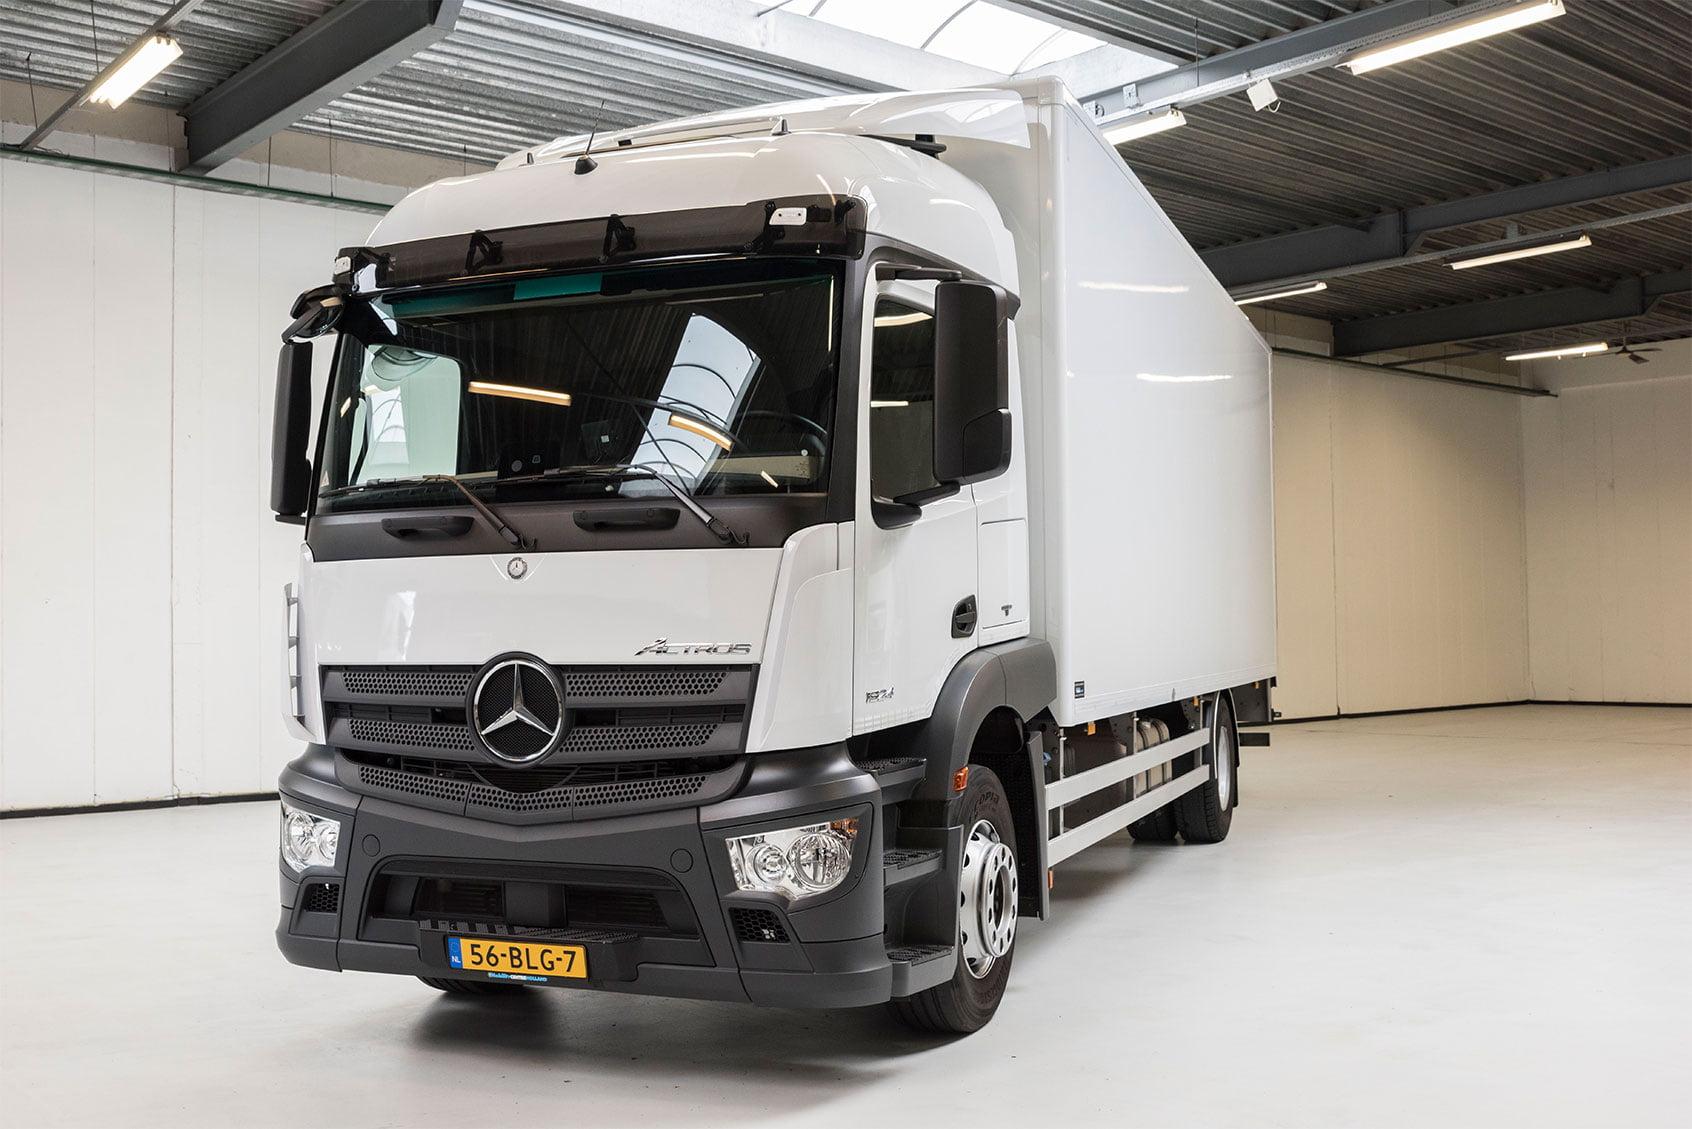 Trucks kopen, huren of leasen bij Mobility Centre Holland